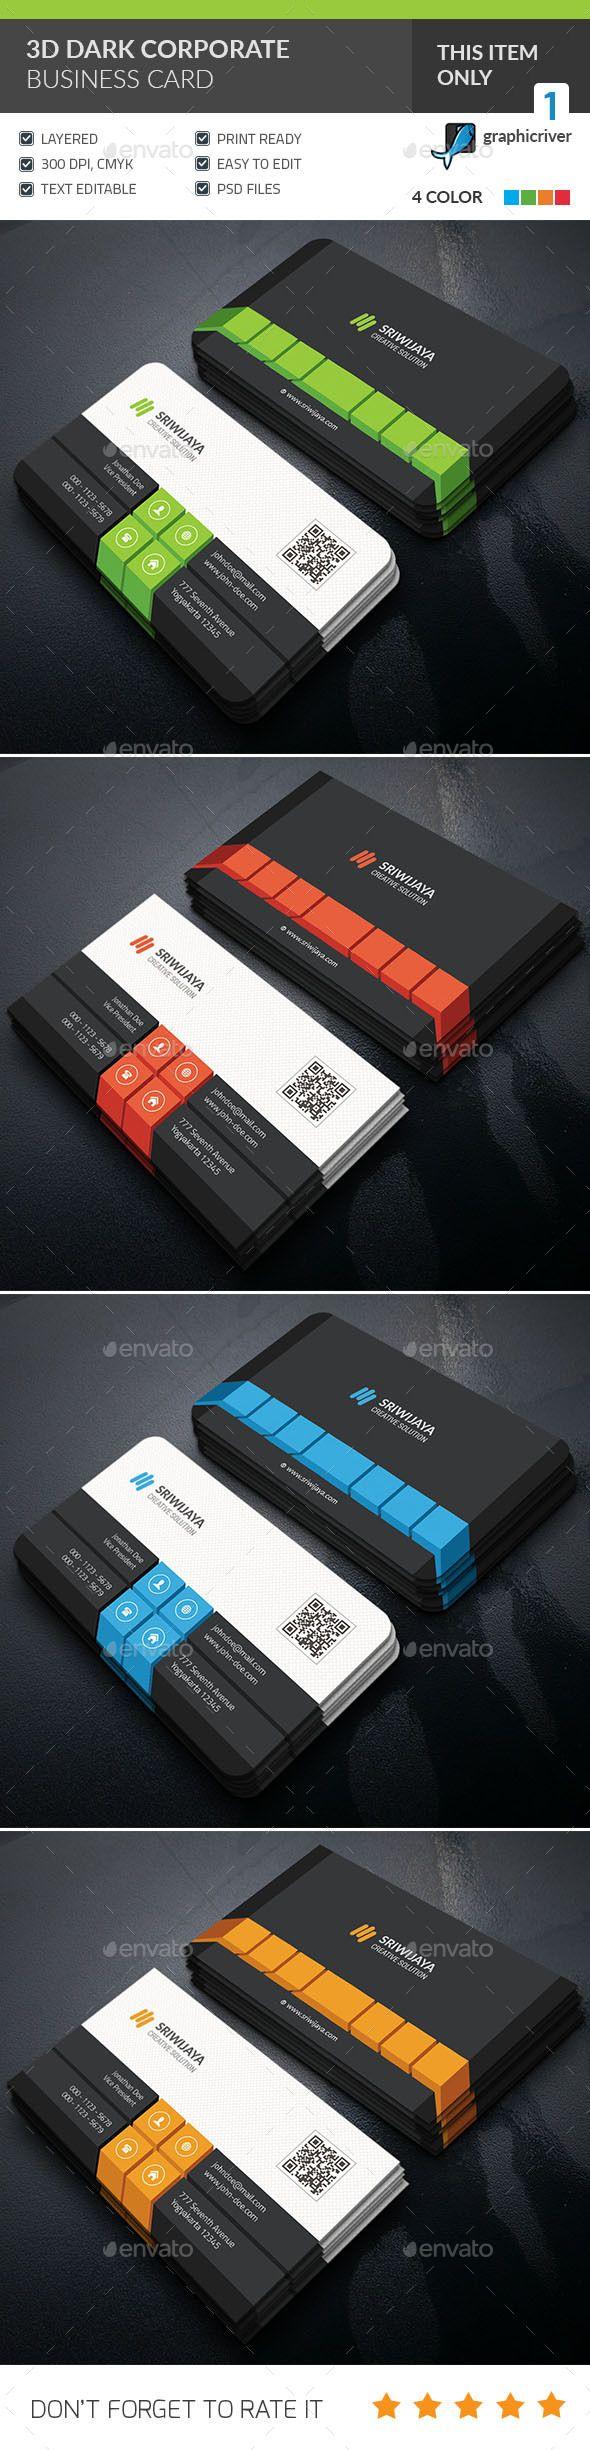 3D Dark Corporate Business Card Design - Corporate Business Card Template PSD. Download here: http://graphicriver.net/item/3d-dark-corporate-business-card-/16777772?s_rank=341&ref=yinkira